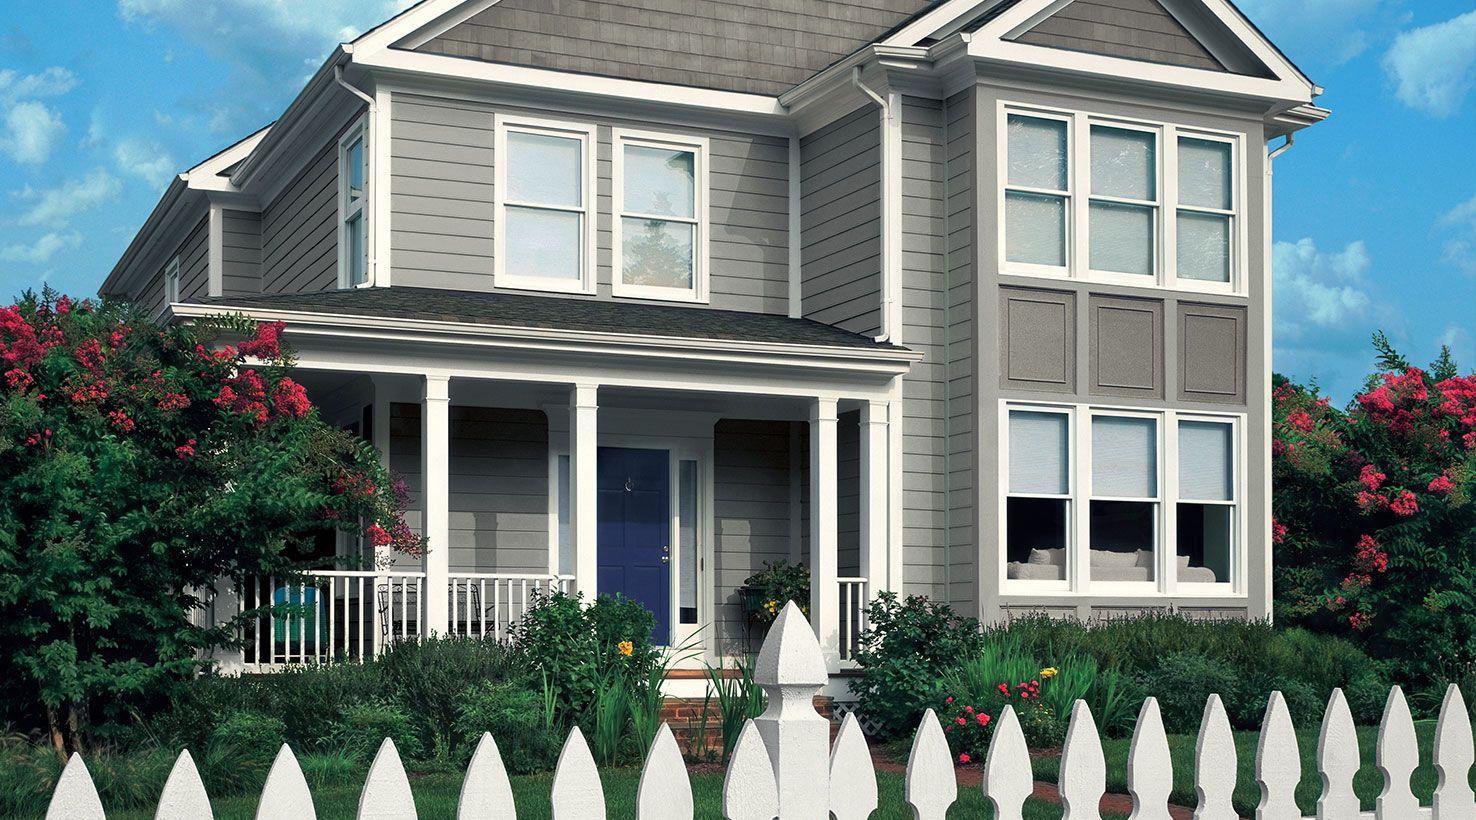 Sherwin Williams Sensible Hue House paint exterior